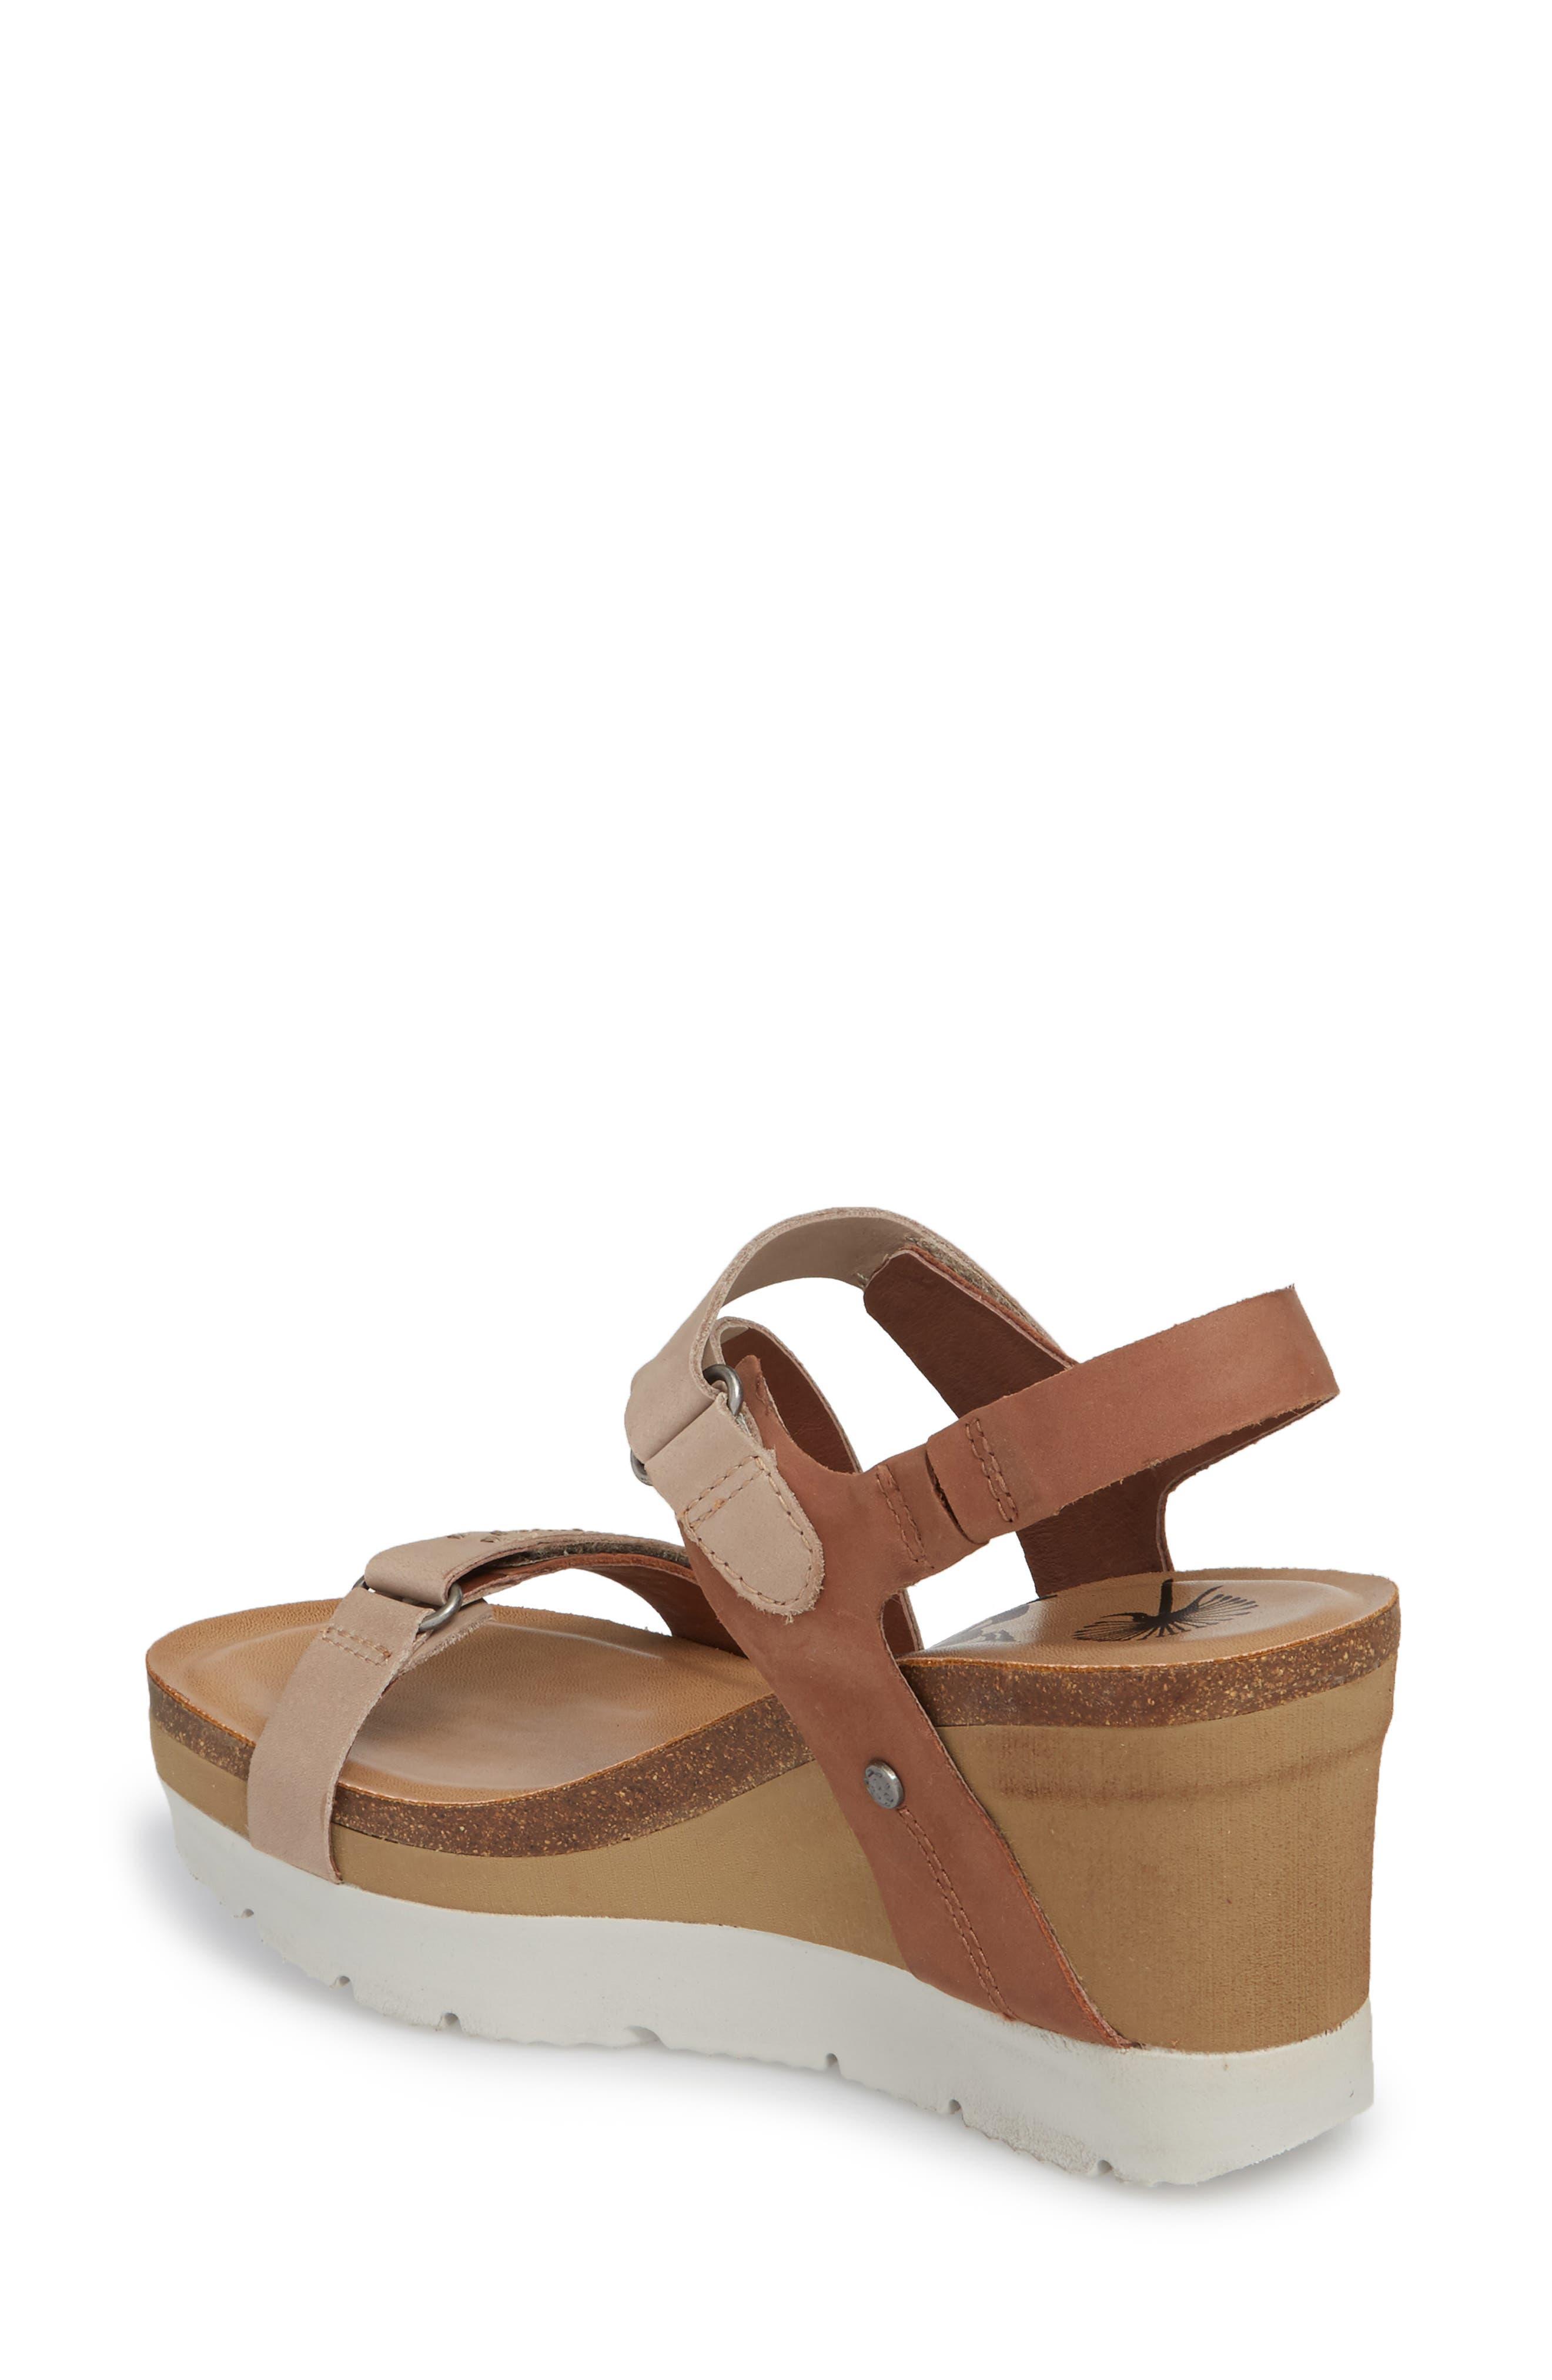 Wavey Wedge Sandal,                             Alternate thumbnail 2, color,                             214